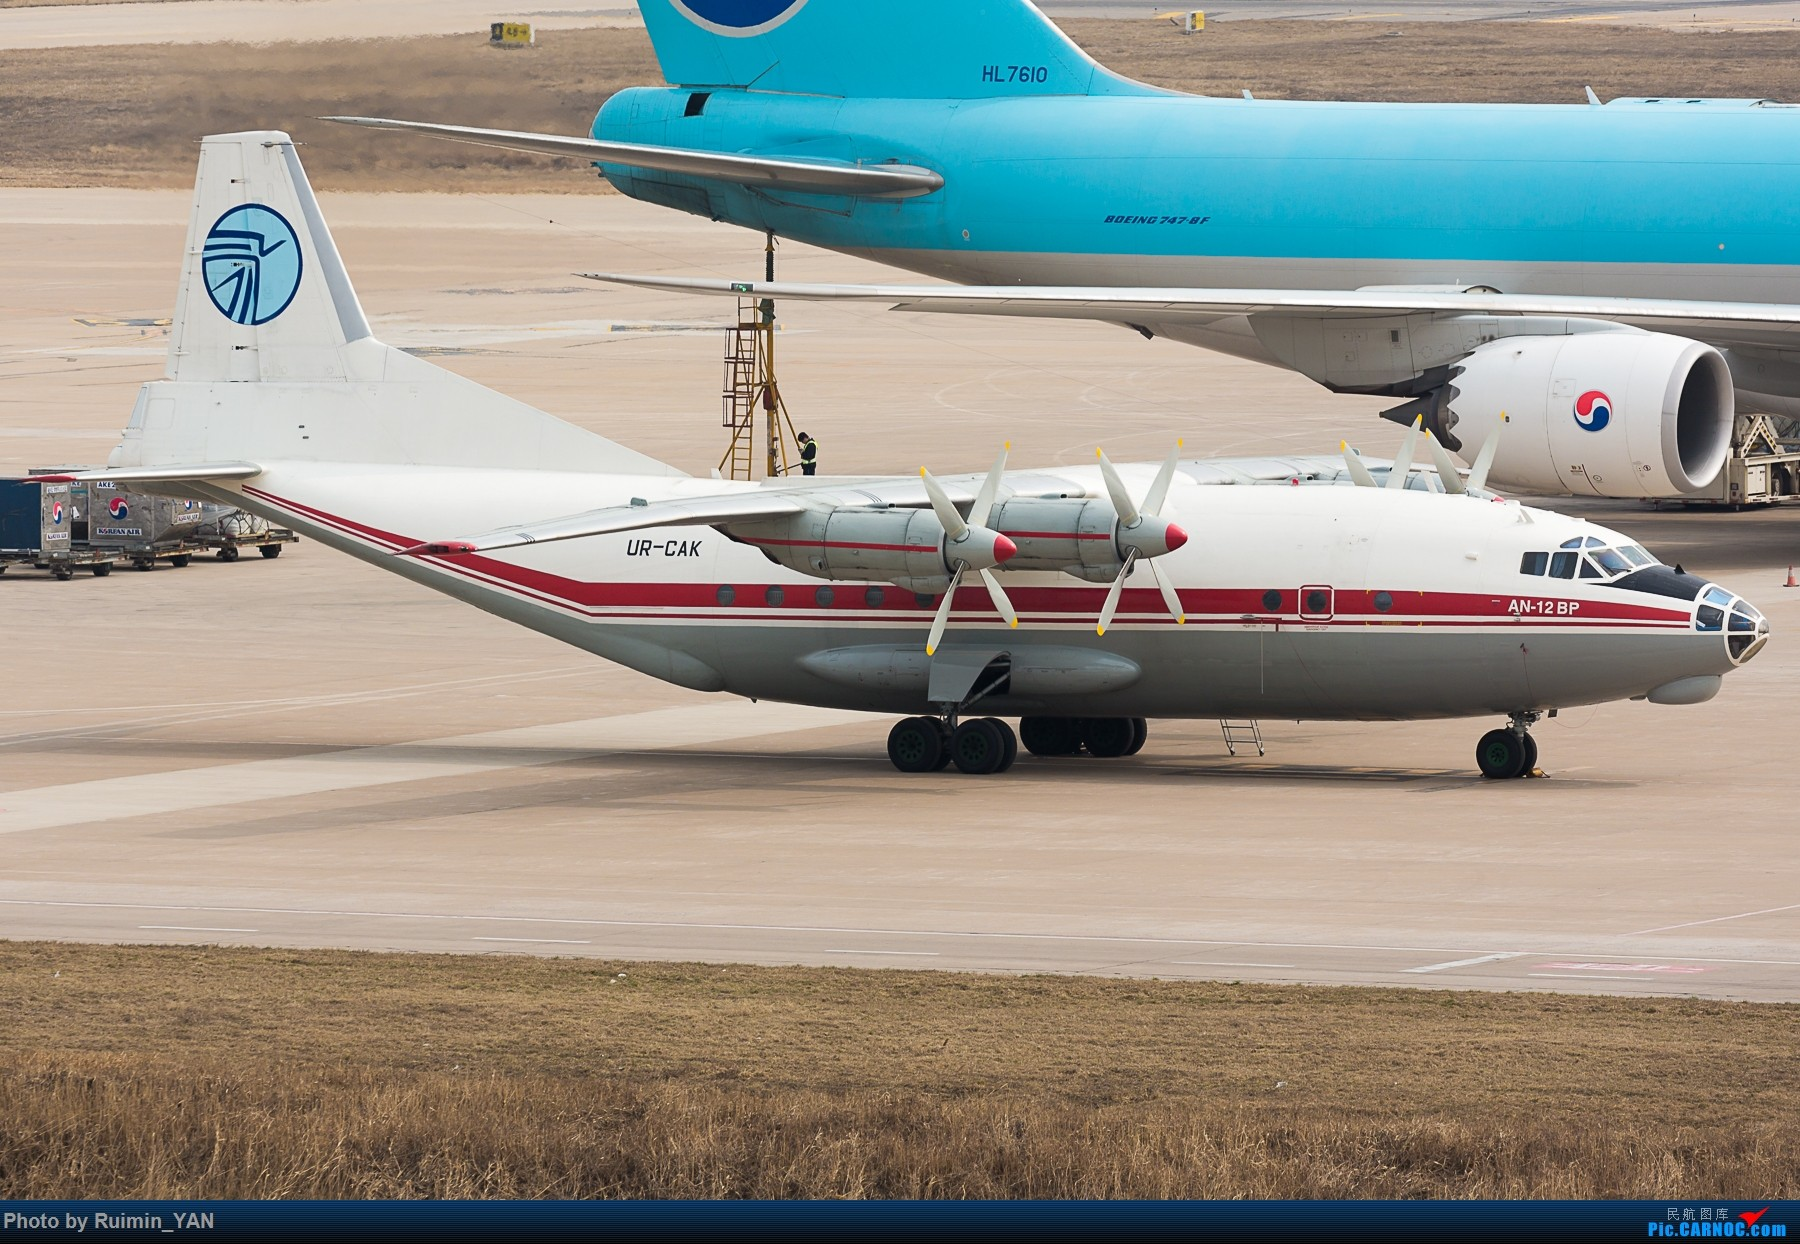 [原创]【TSN飞友会】【一图党】Ukraine Air Alliance (UAA) Aviation安-12--天津机场国际临时航班(LSUKL4006) ANTONOV AN-12 UR-CAK 中国天津滨海国际机场